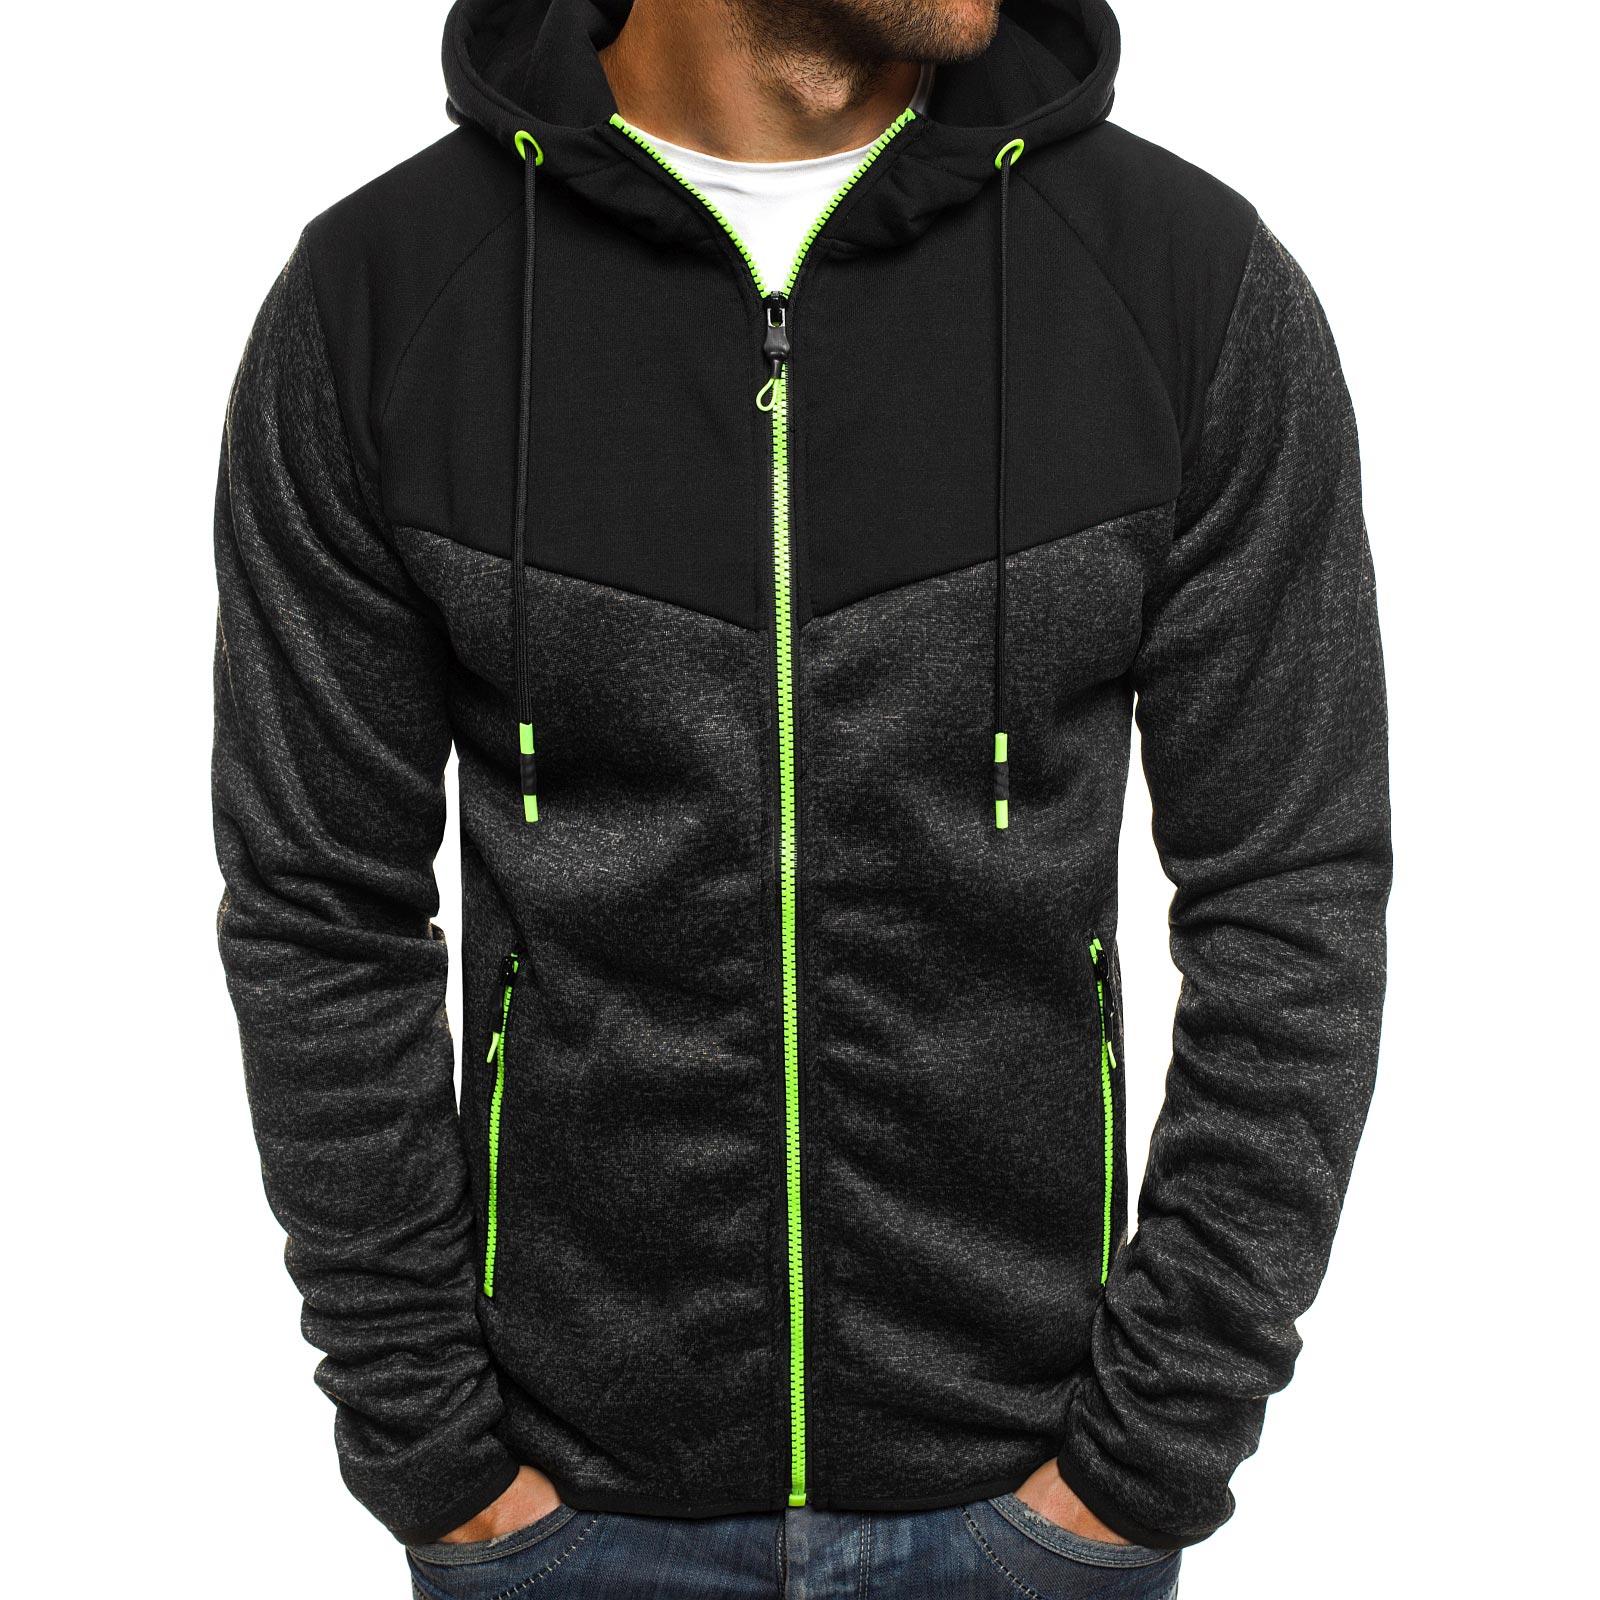 OZONEE-J-STYLE-Herren-Kapuzenpullover-Sweatshirt-Pullover-Kapuze-Sweatjacke-MIX